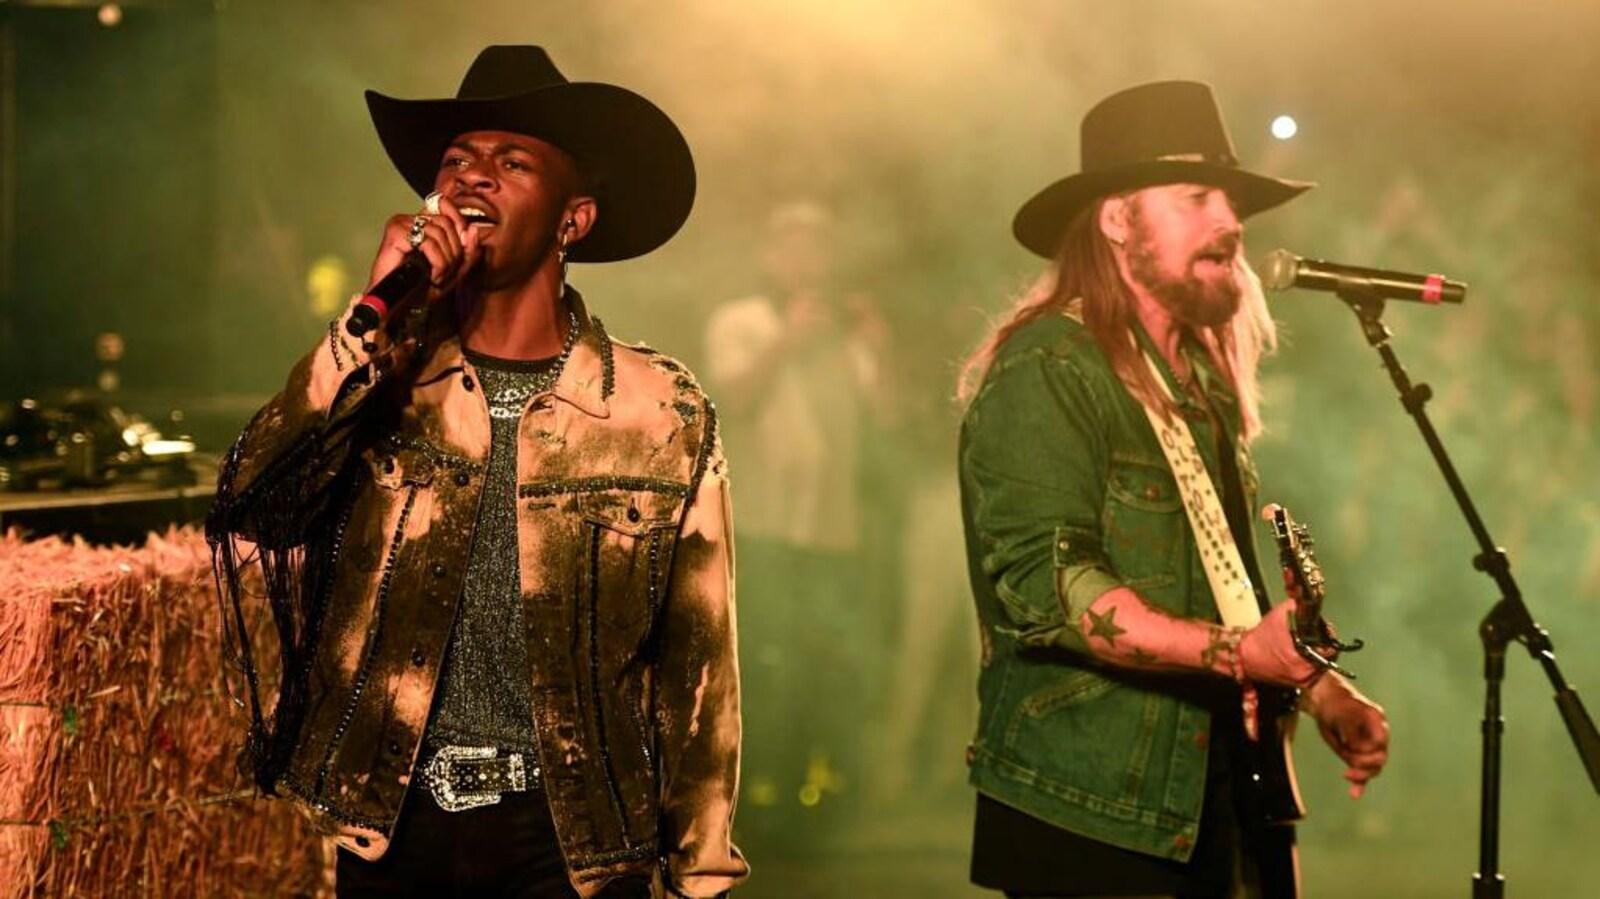 Lil Nas X et Billy Ray Cyrus chantent en tenue de cowboy.